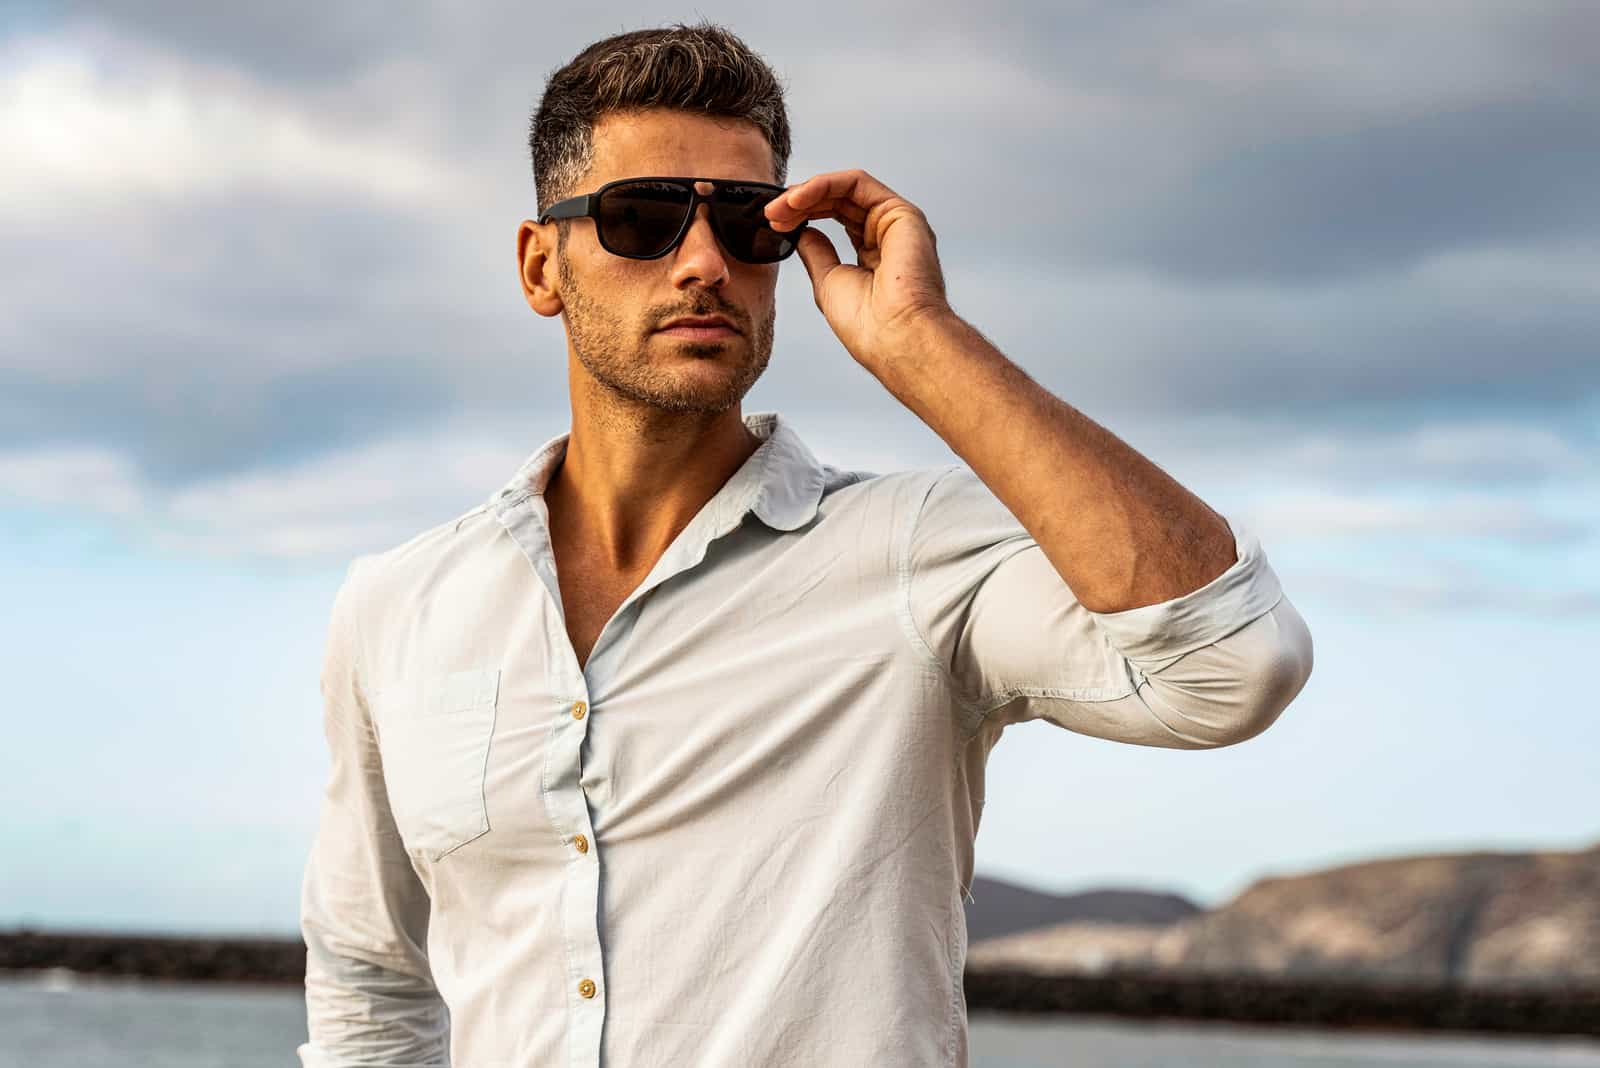 Gorgeous stylish man wearing fashionable shirt and sunglasses